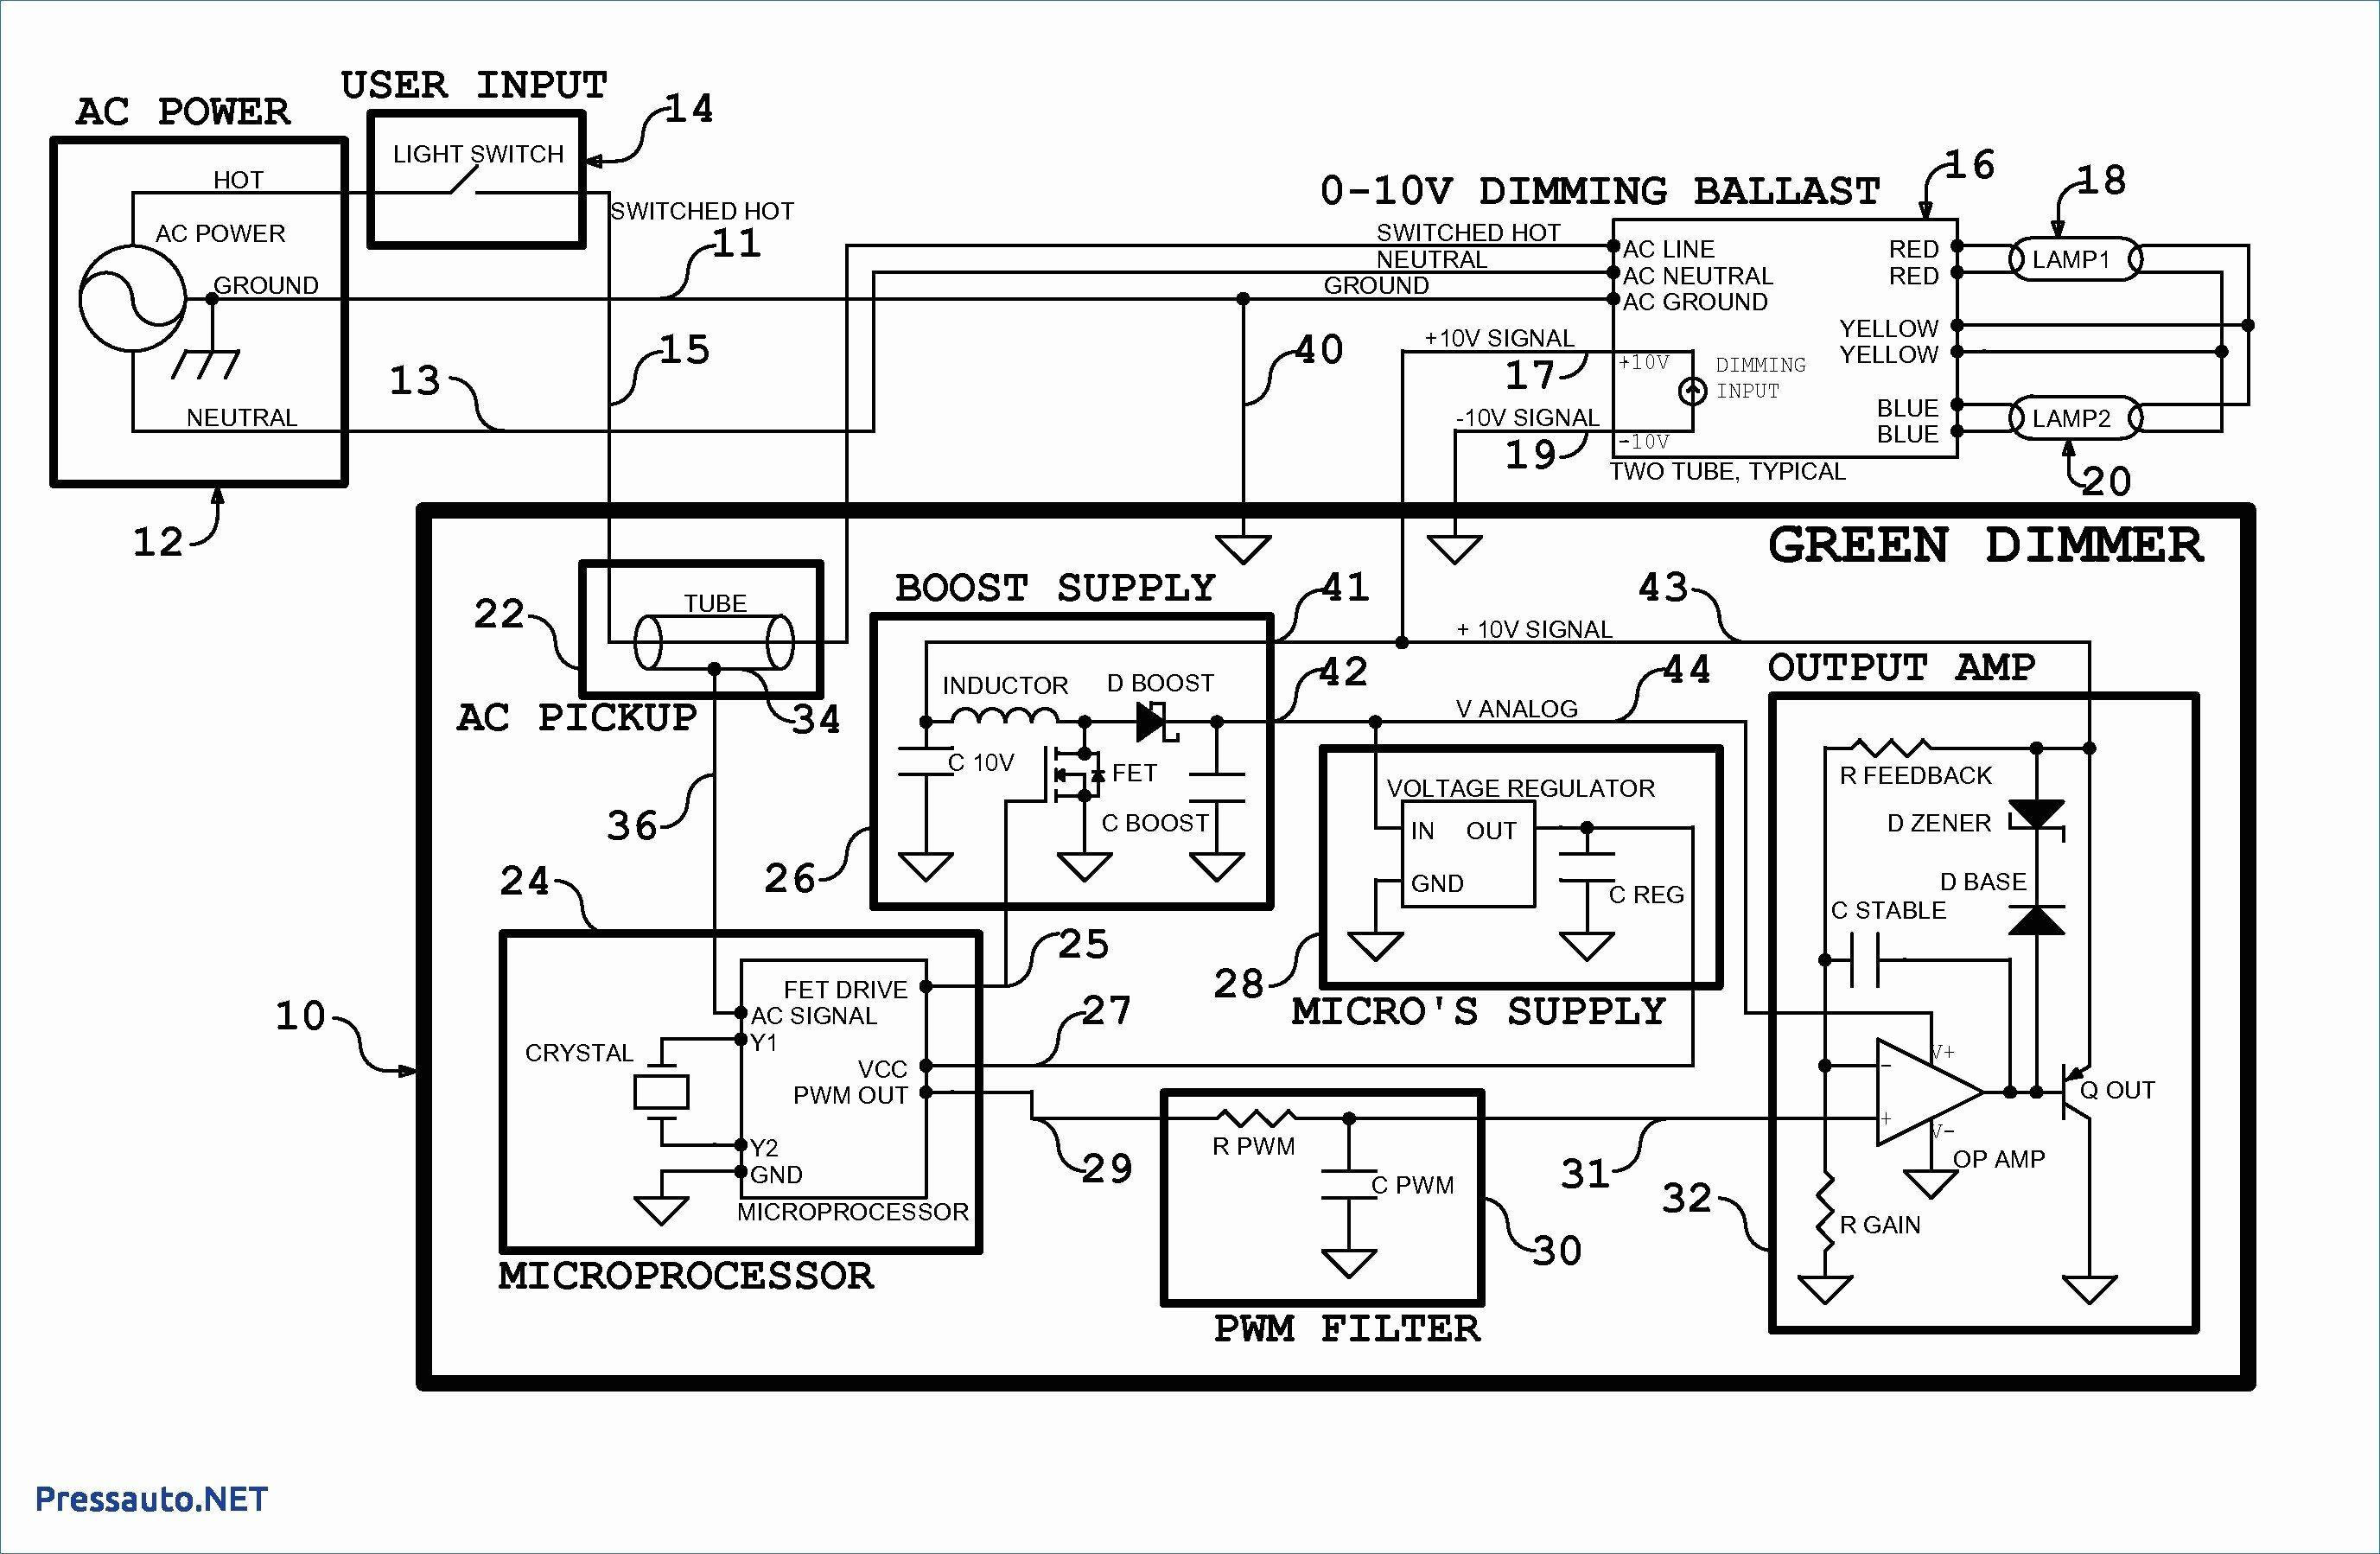 60 Best Of 0 10 Volt Dimming Wiring Diagram Pics | Wsmce - 0 10 Volt Dimming Wiring Diagram